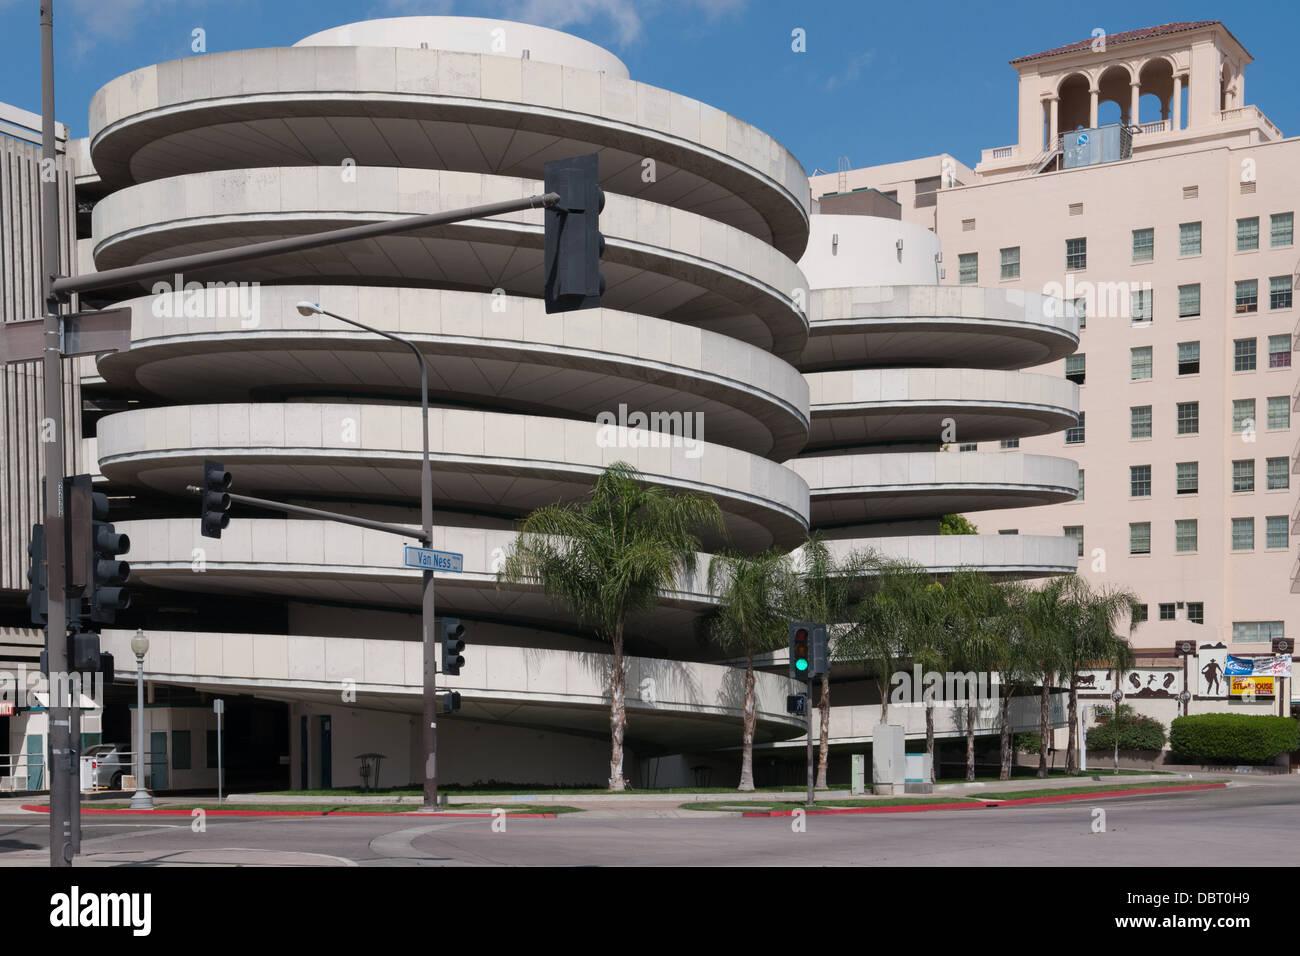 parking garage in downtown Fresno, California Stock Photo